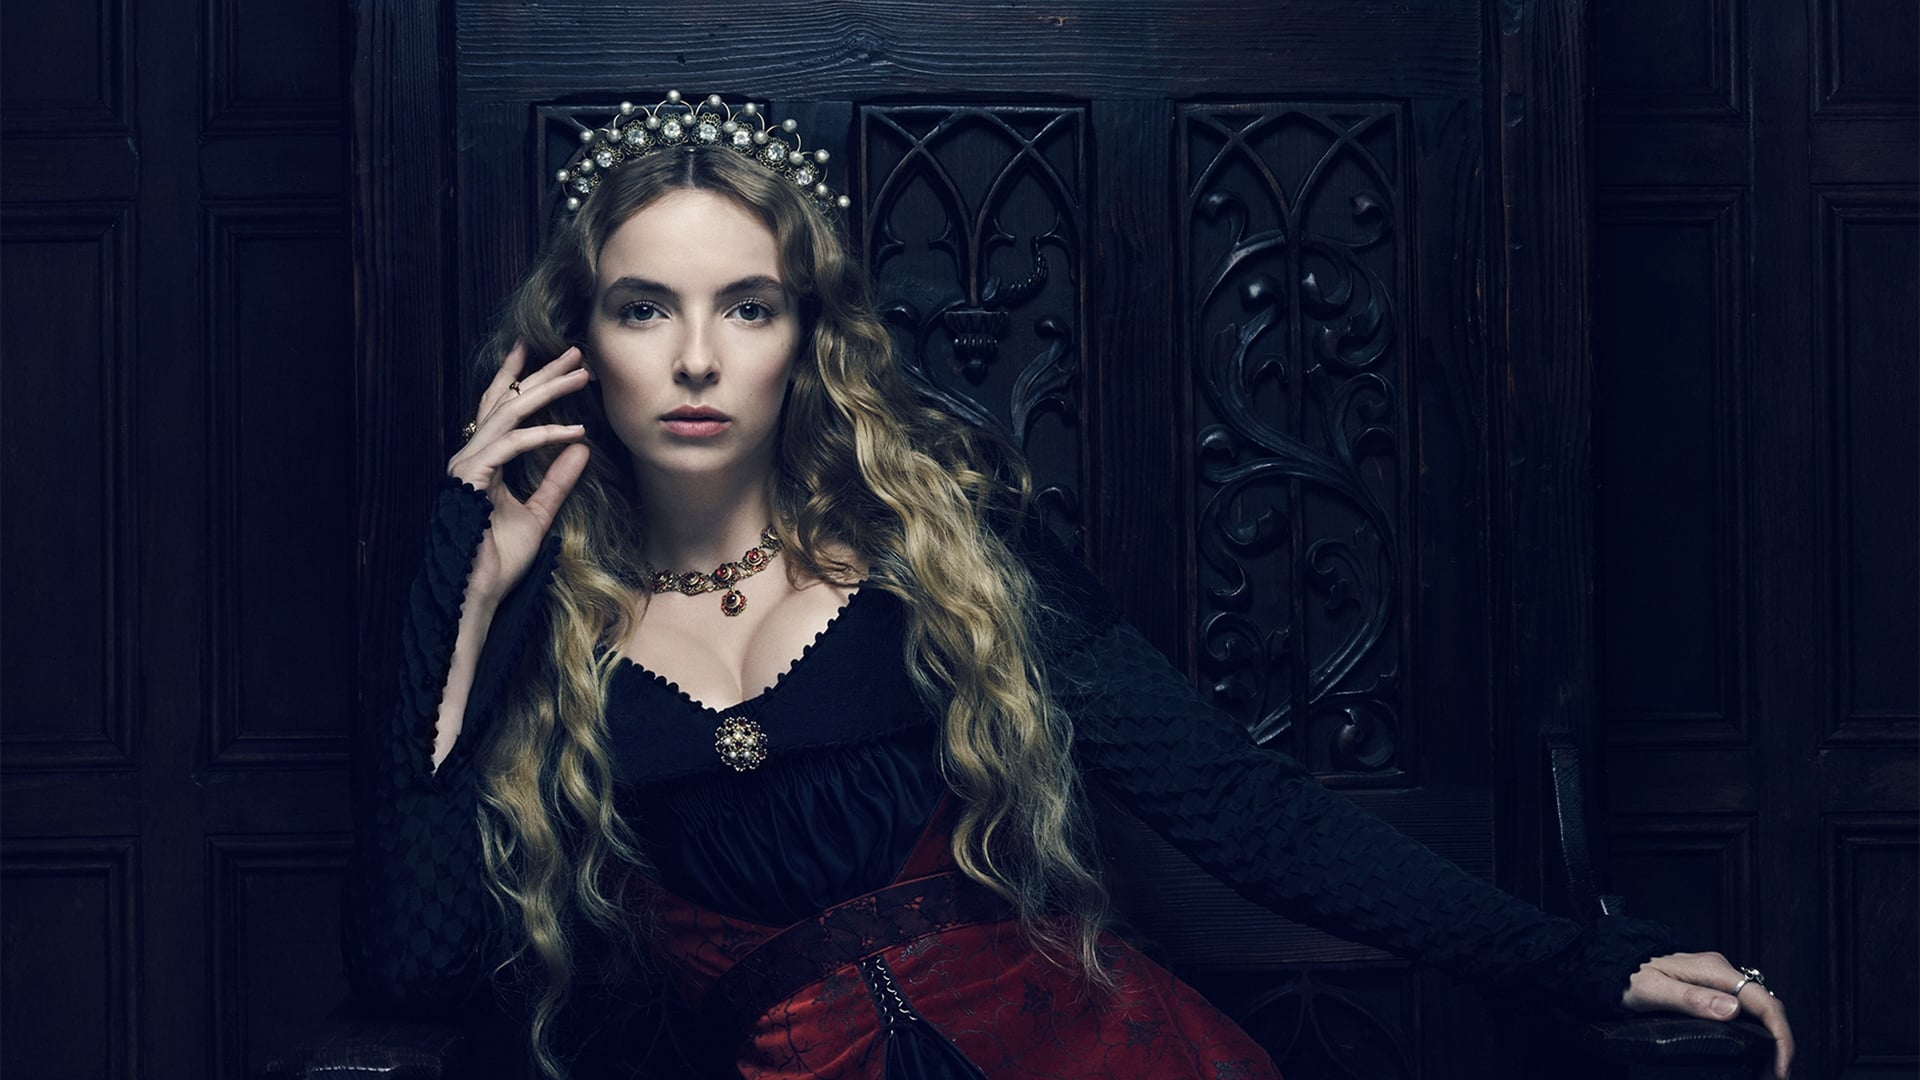 Ver The White Princess, no te pierdas la serie completa